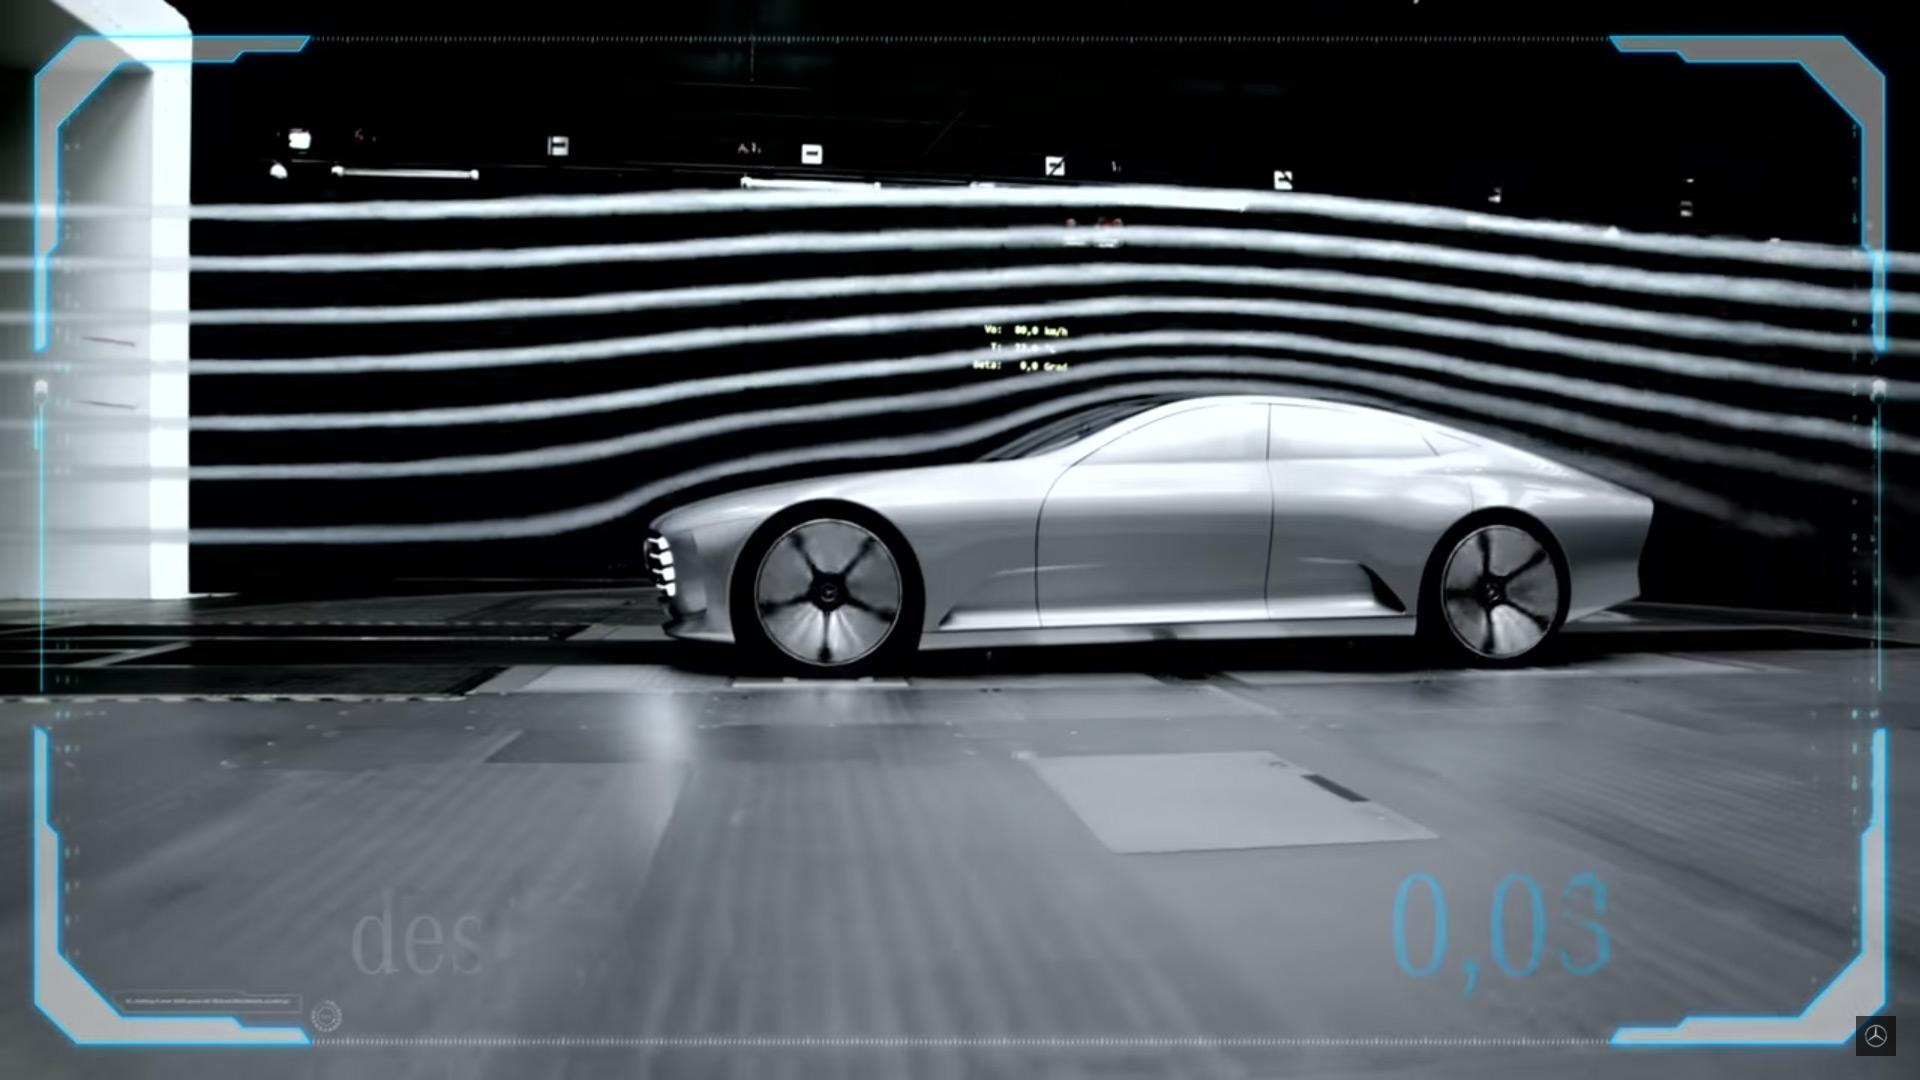 IAA Concept Car Sideview Aerodynamic Demonstration